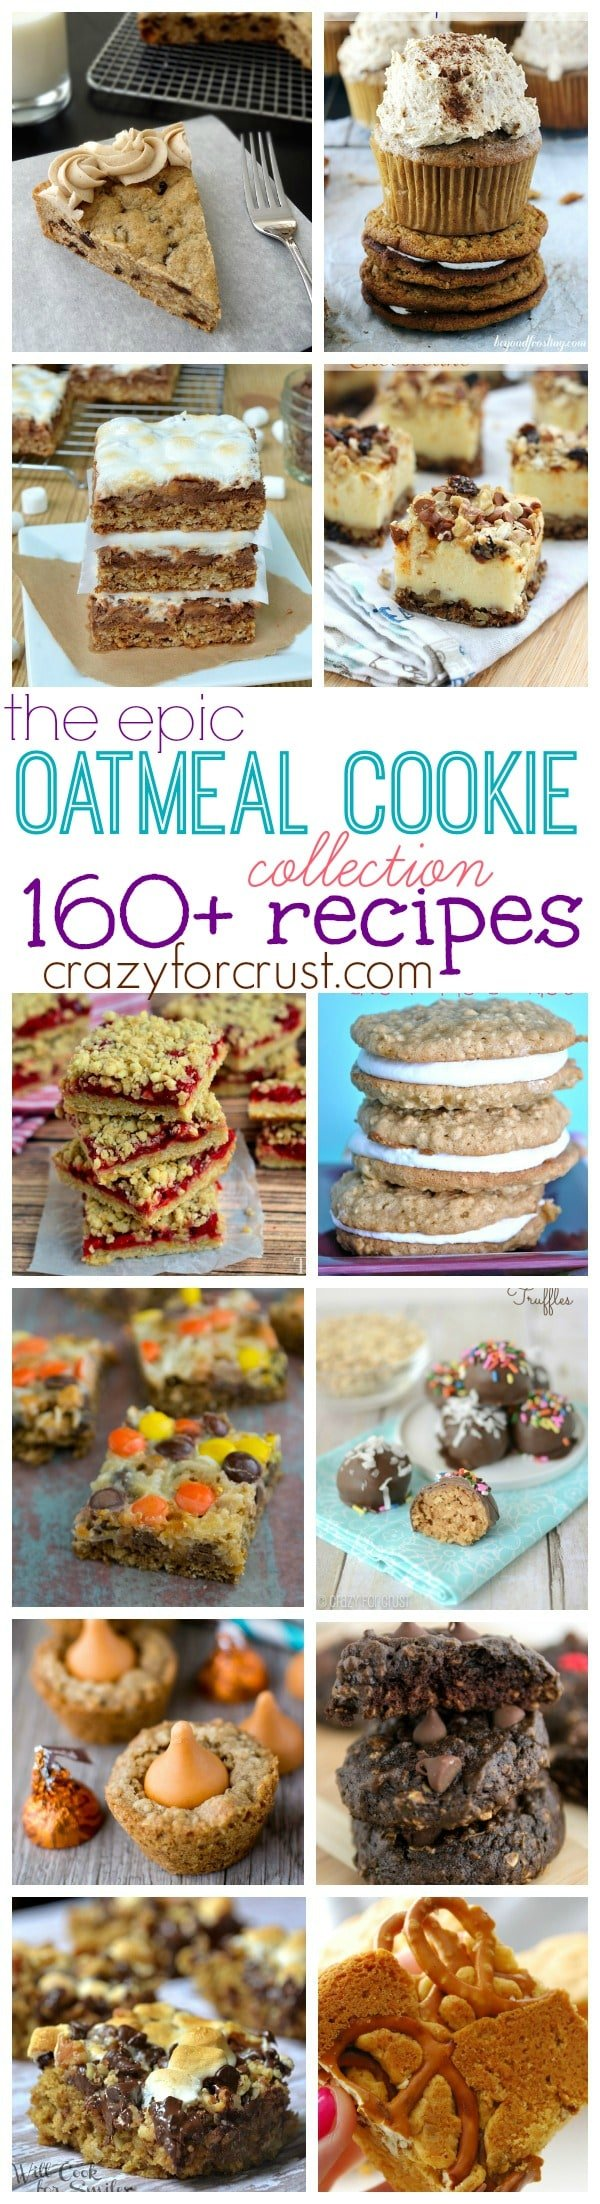 Over 160 Oatmeal Cookie Recipes | www.crazyforcrust.com